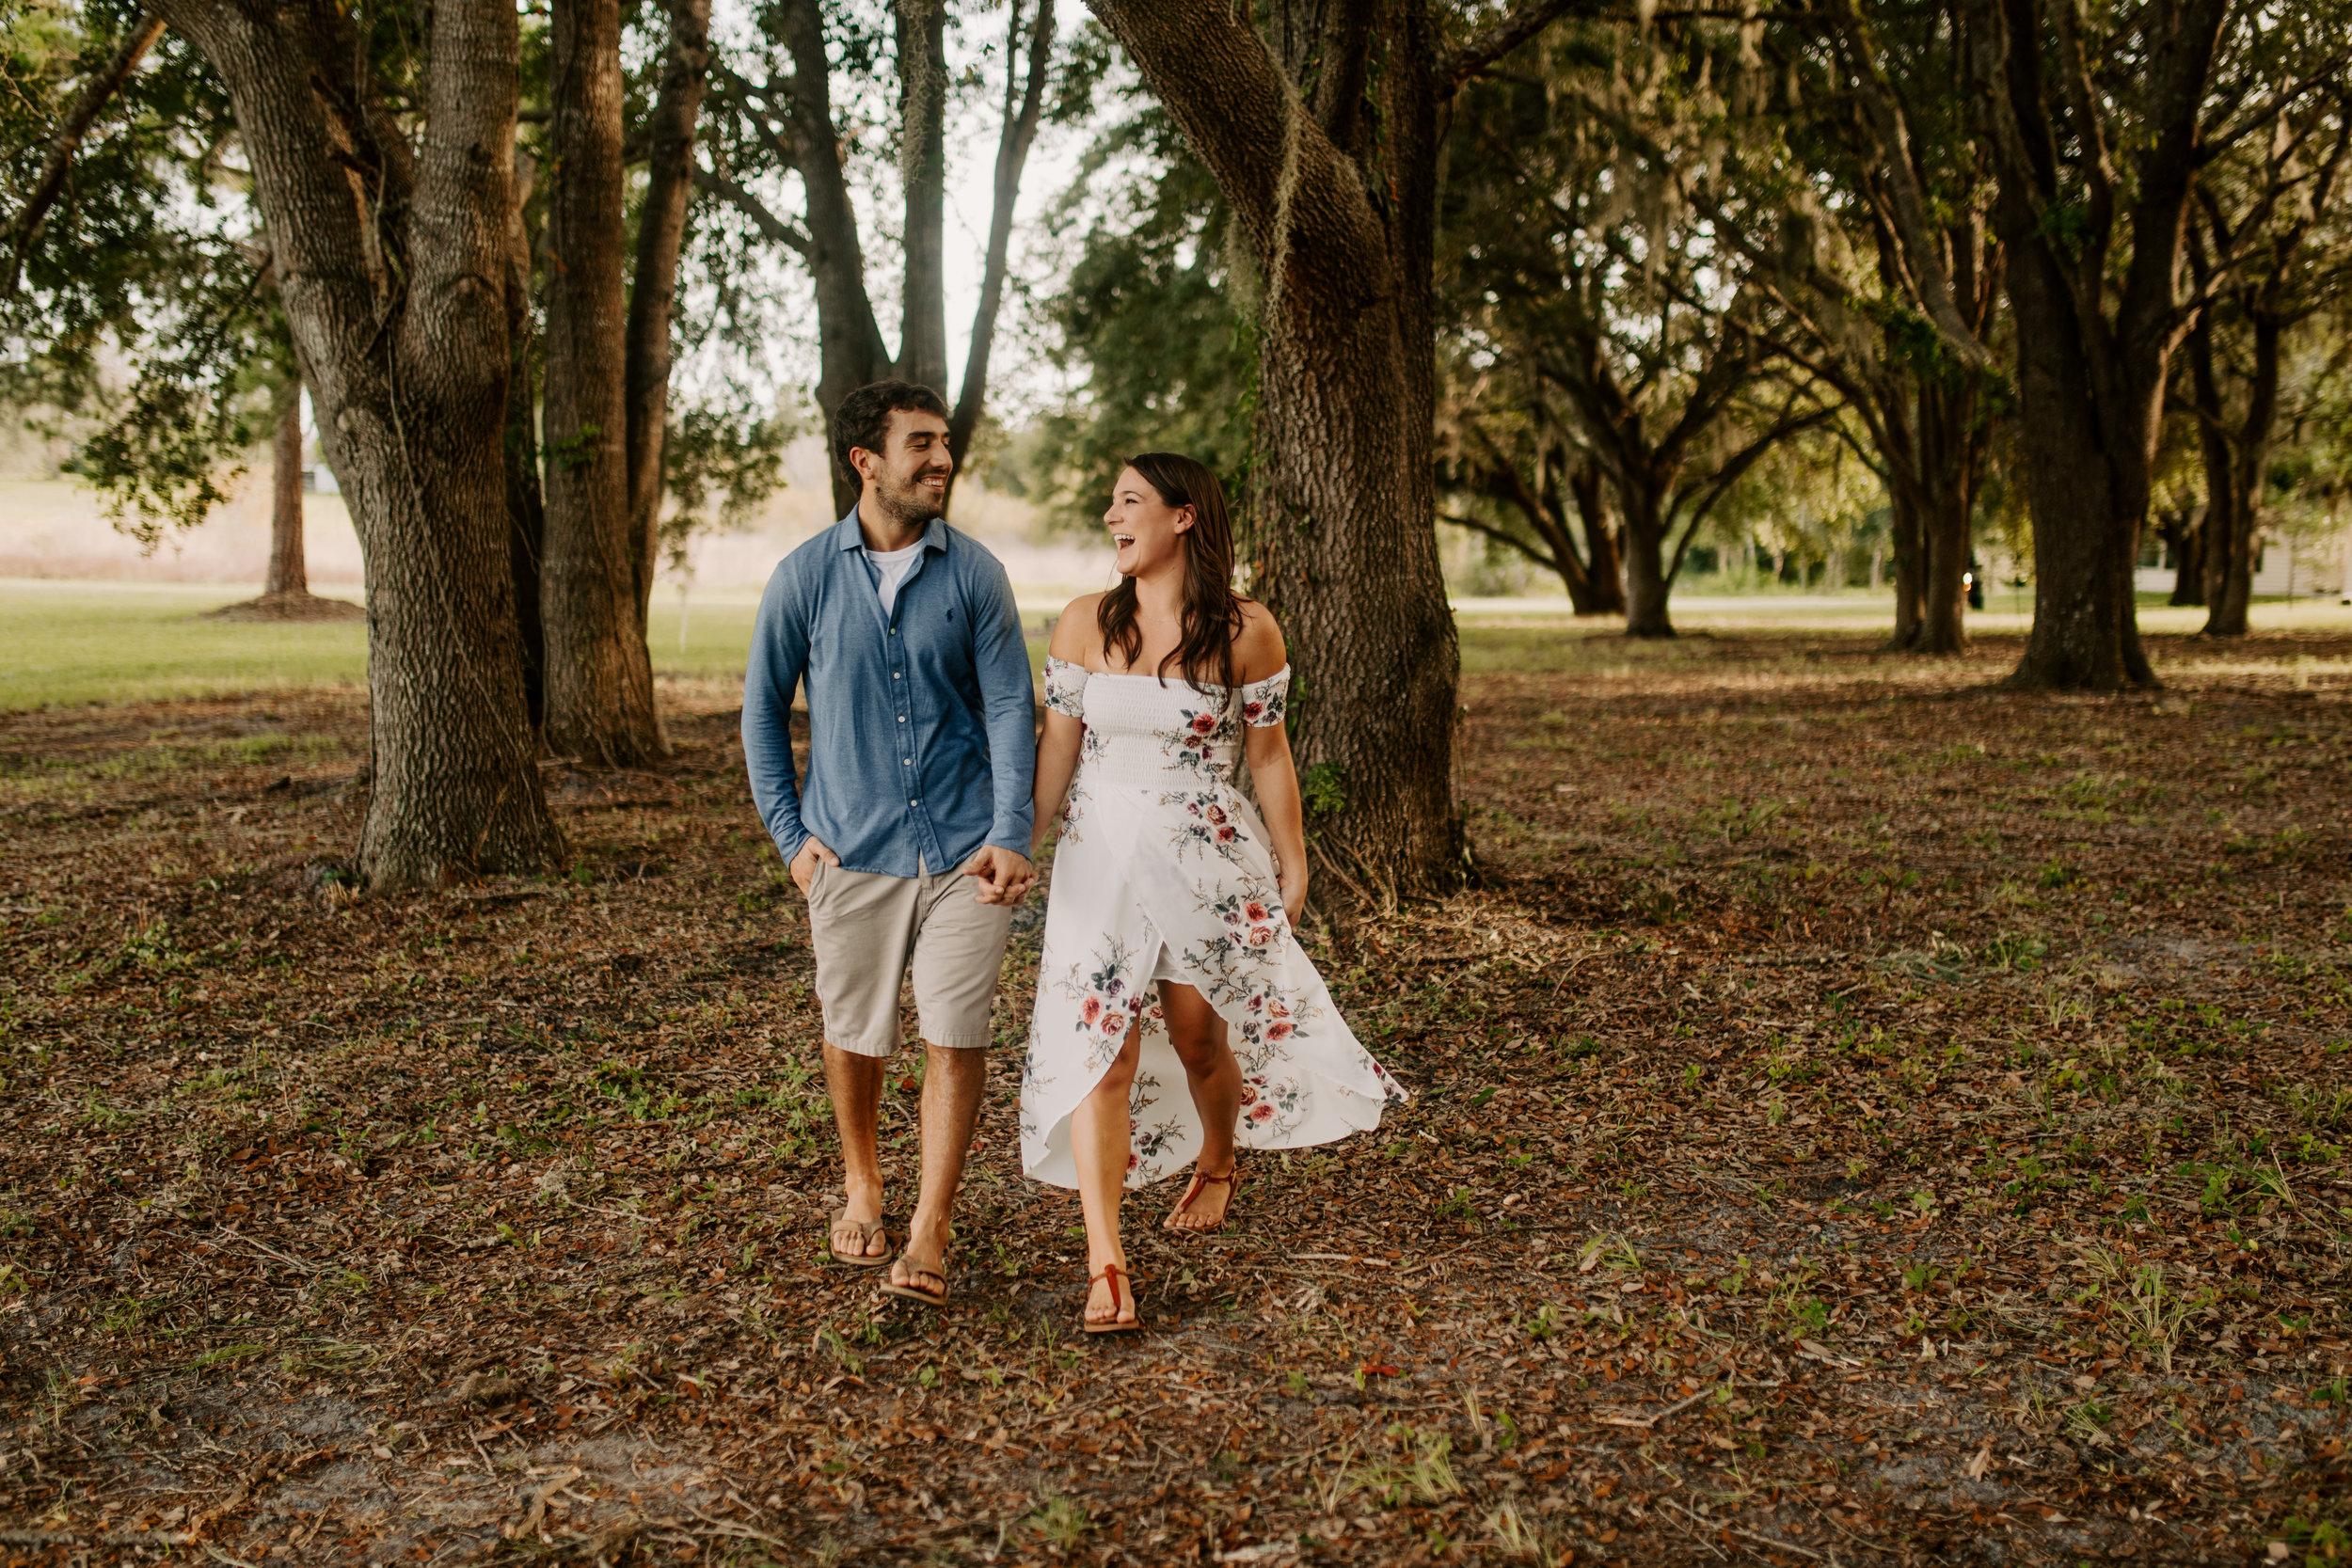 Jenna_+_Ryan_-_Native_Expressions_-_Florida_Engagement-6.jpg